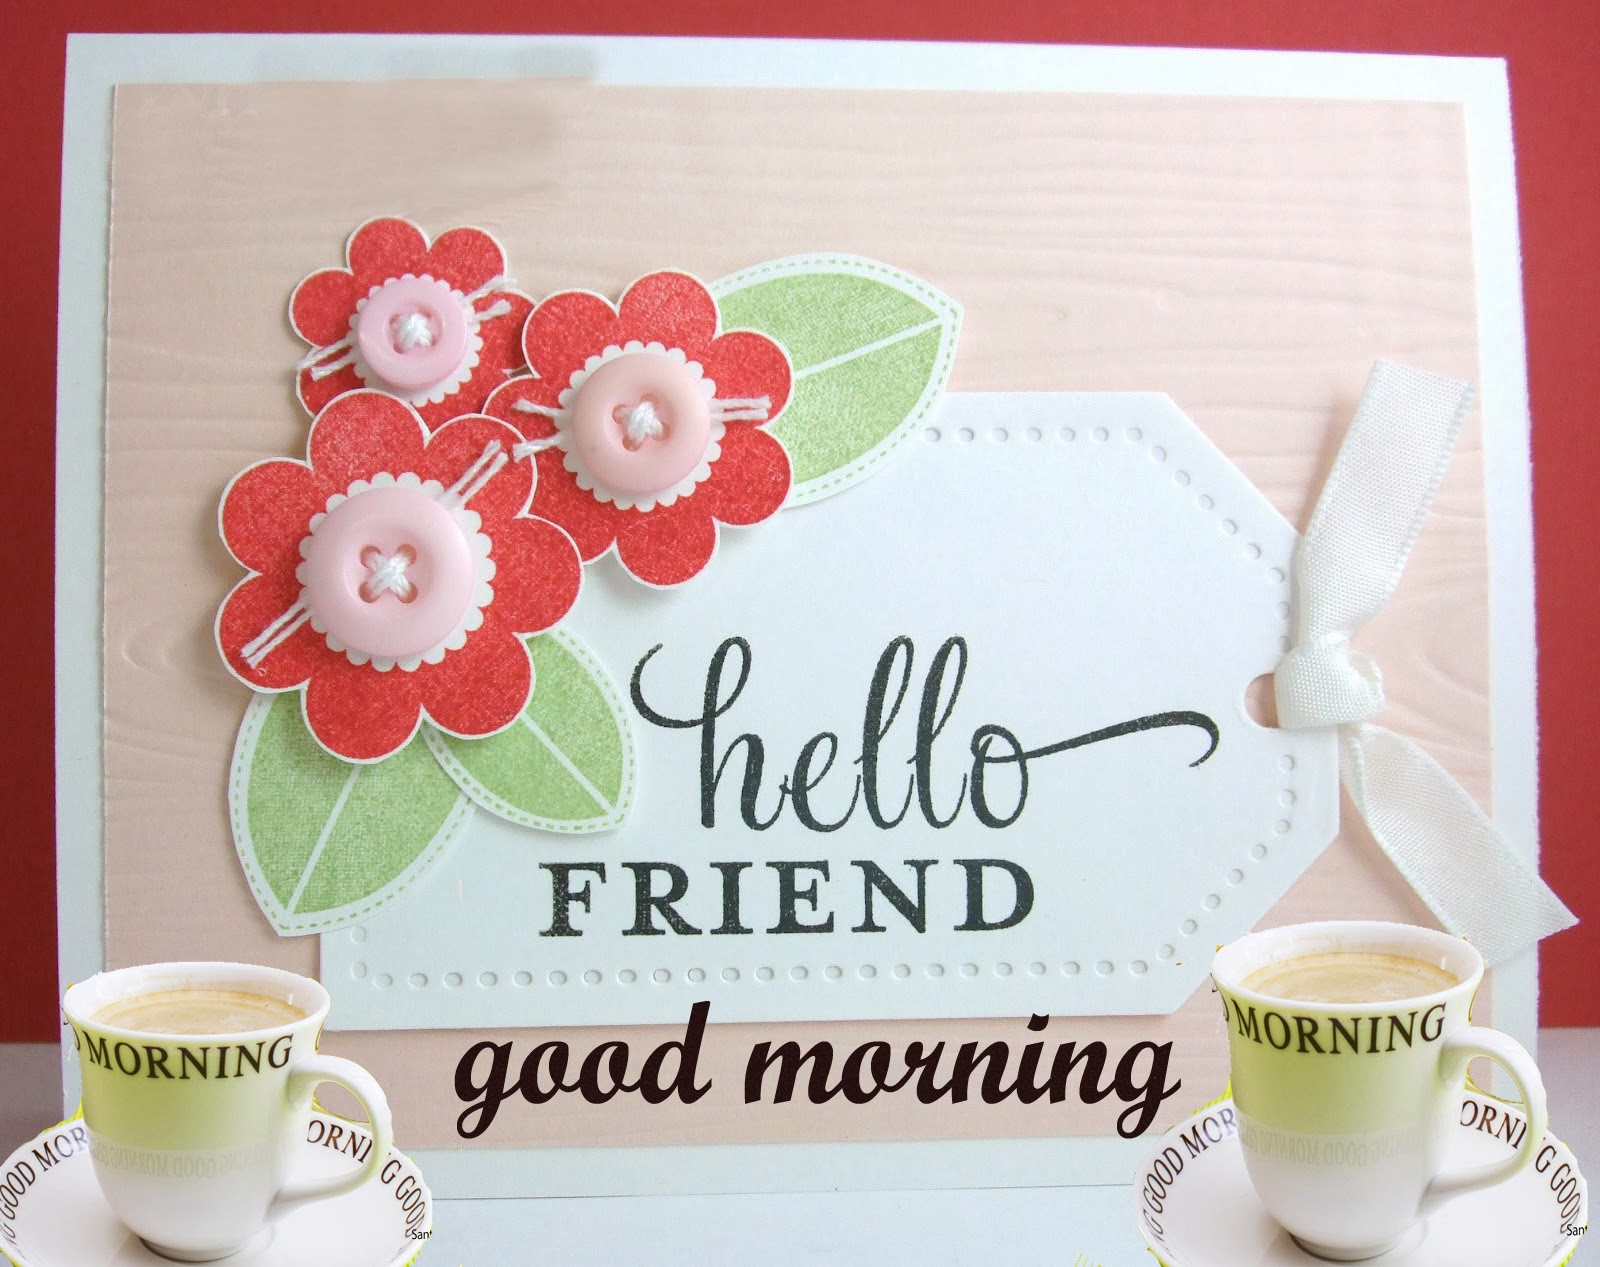 Goodmorning Wallpapers - WallpaperSafari Good Morning Friends Wallpaper Hd